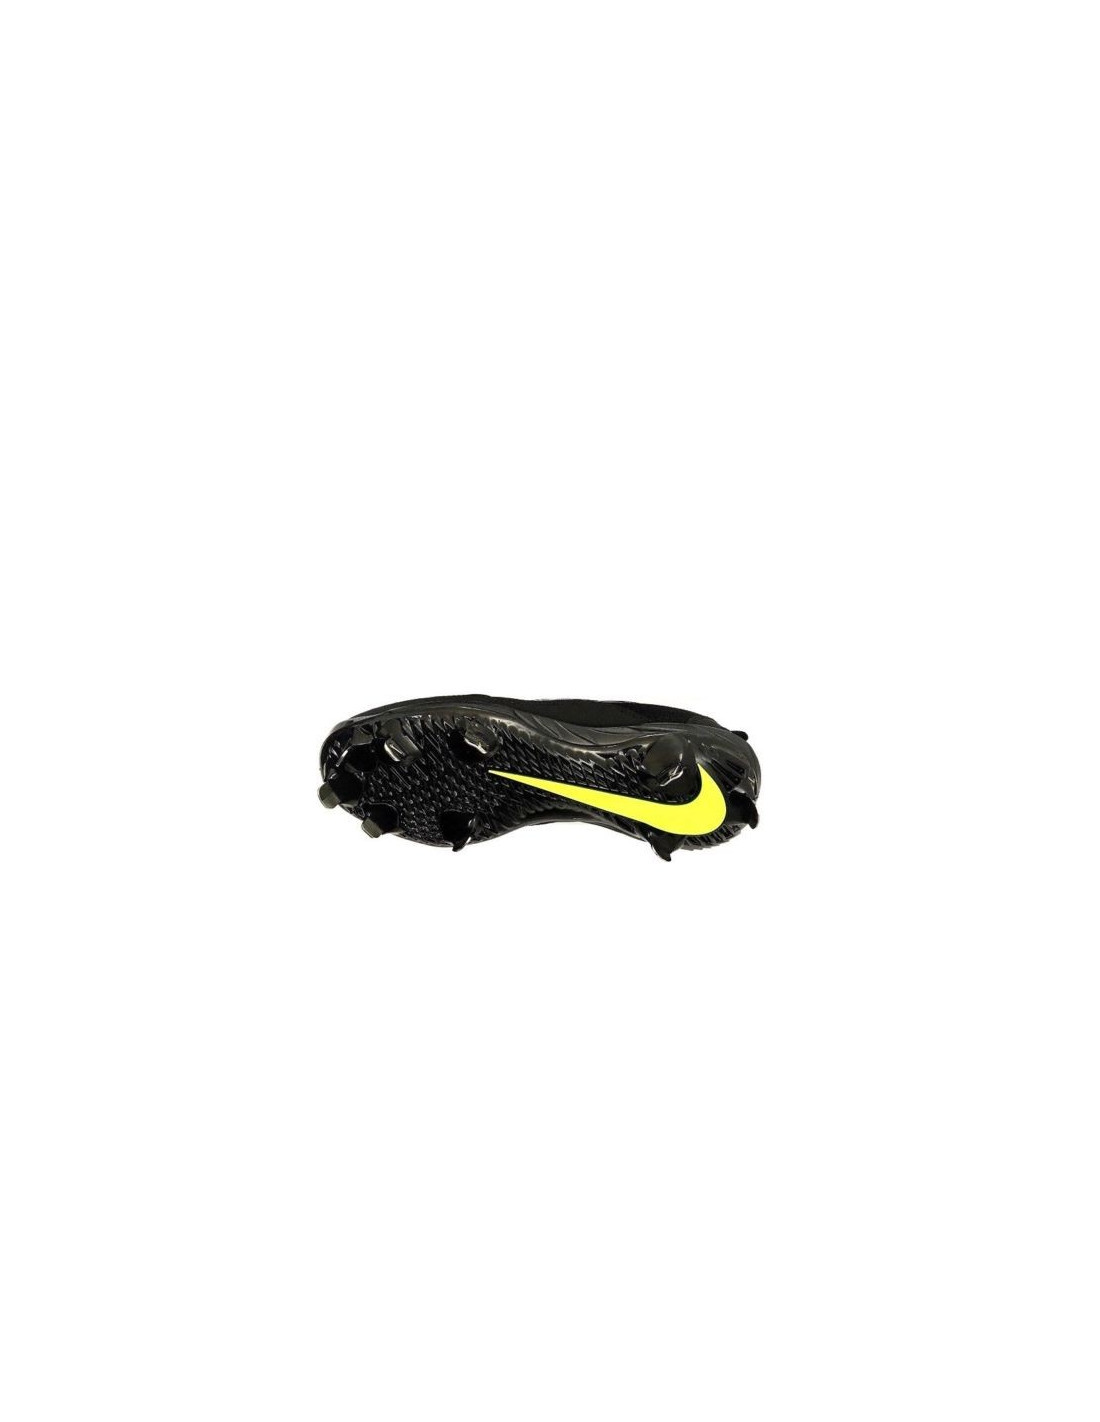 6baa6f00529 Nike Women s Lunar Hyperdiamond 2 Pro Softball Cleats (US 8) Black